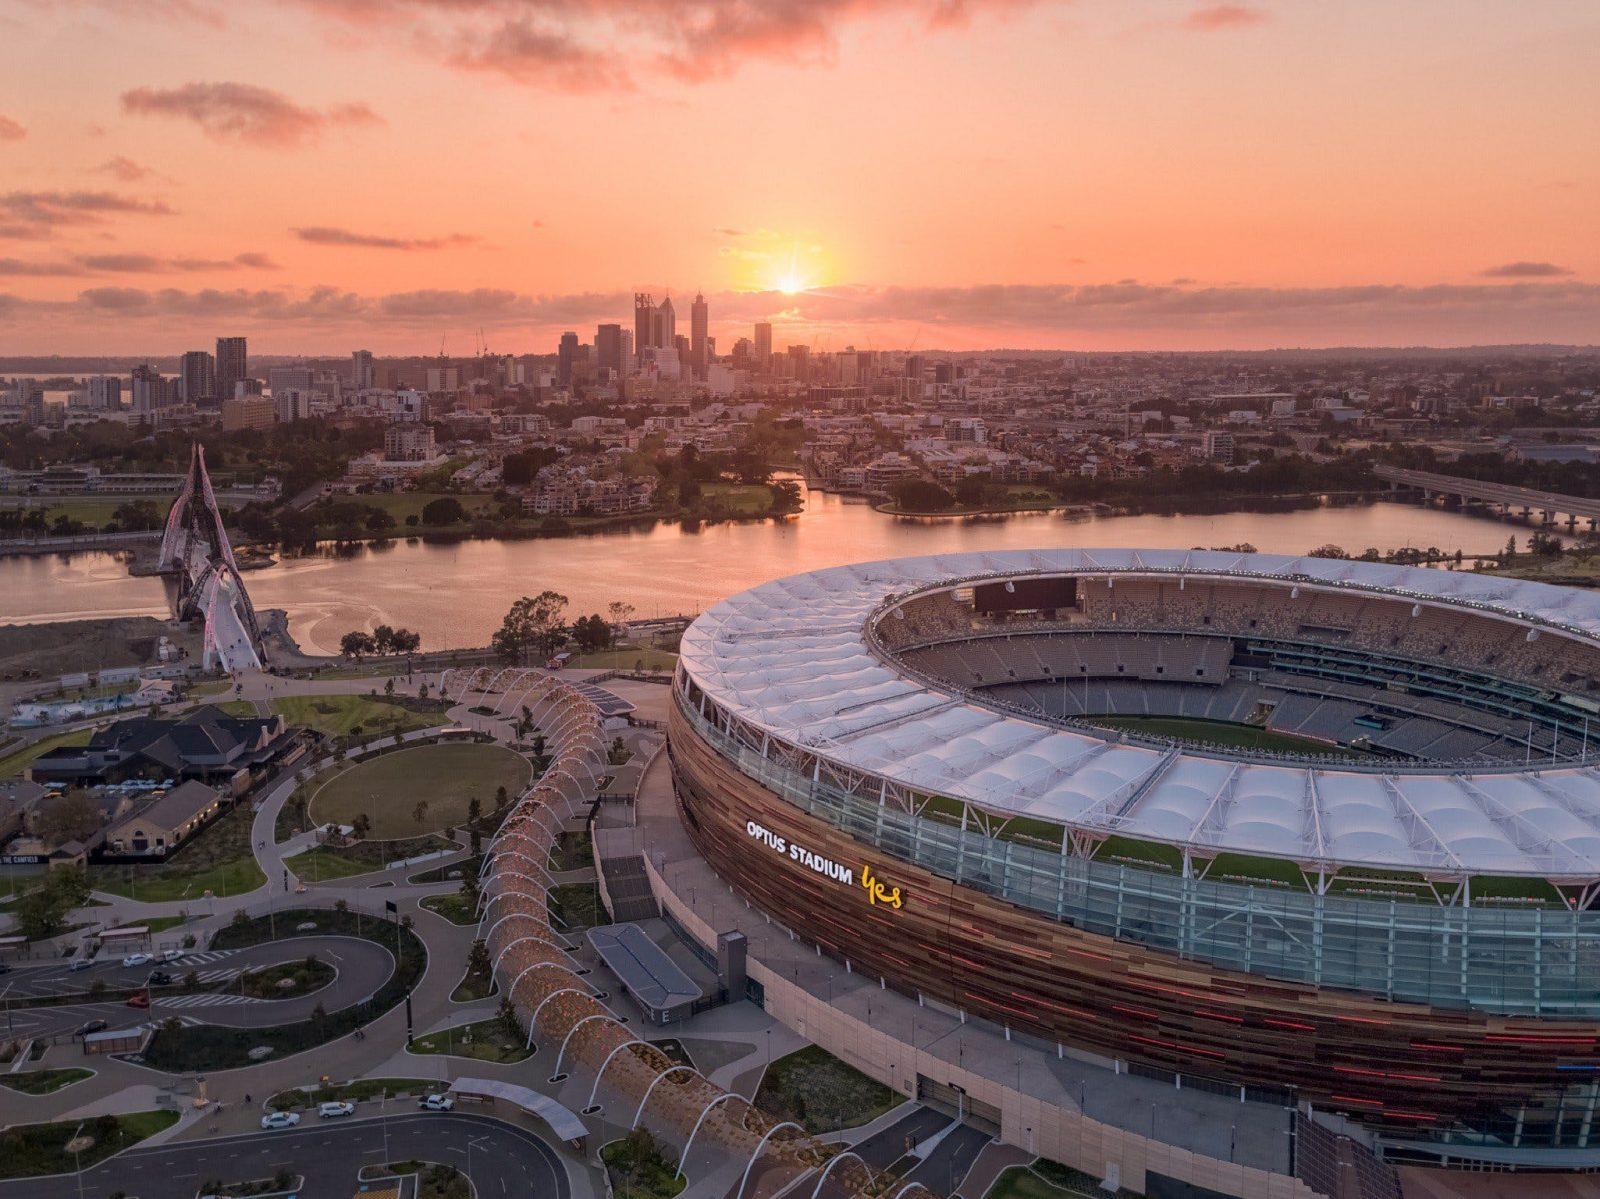 AFL 2019 | Round 2, Burswood, Western Australia